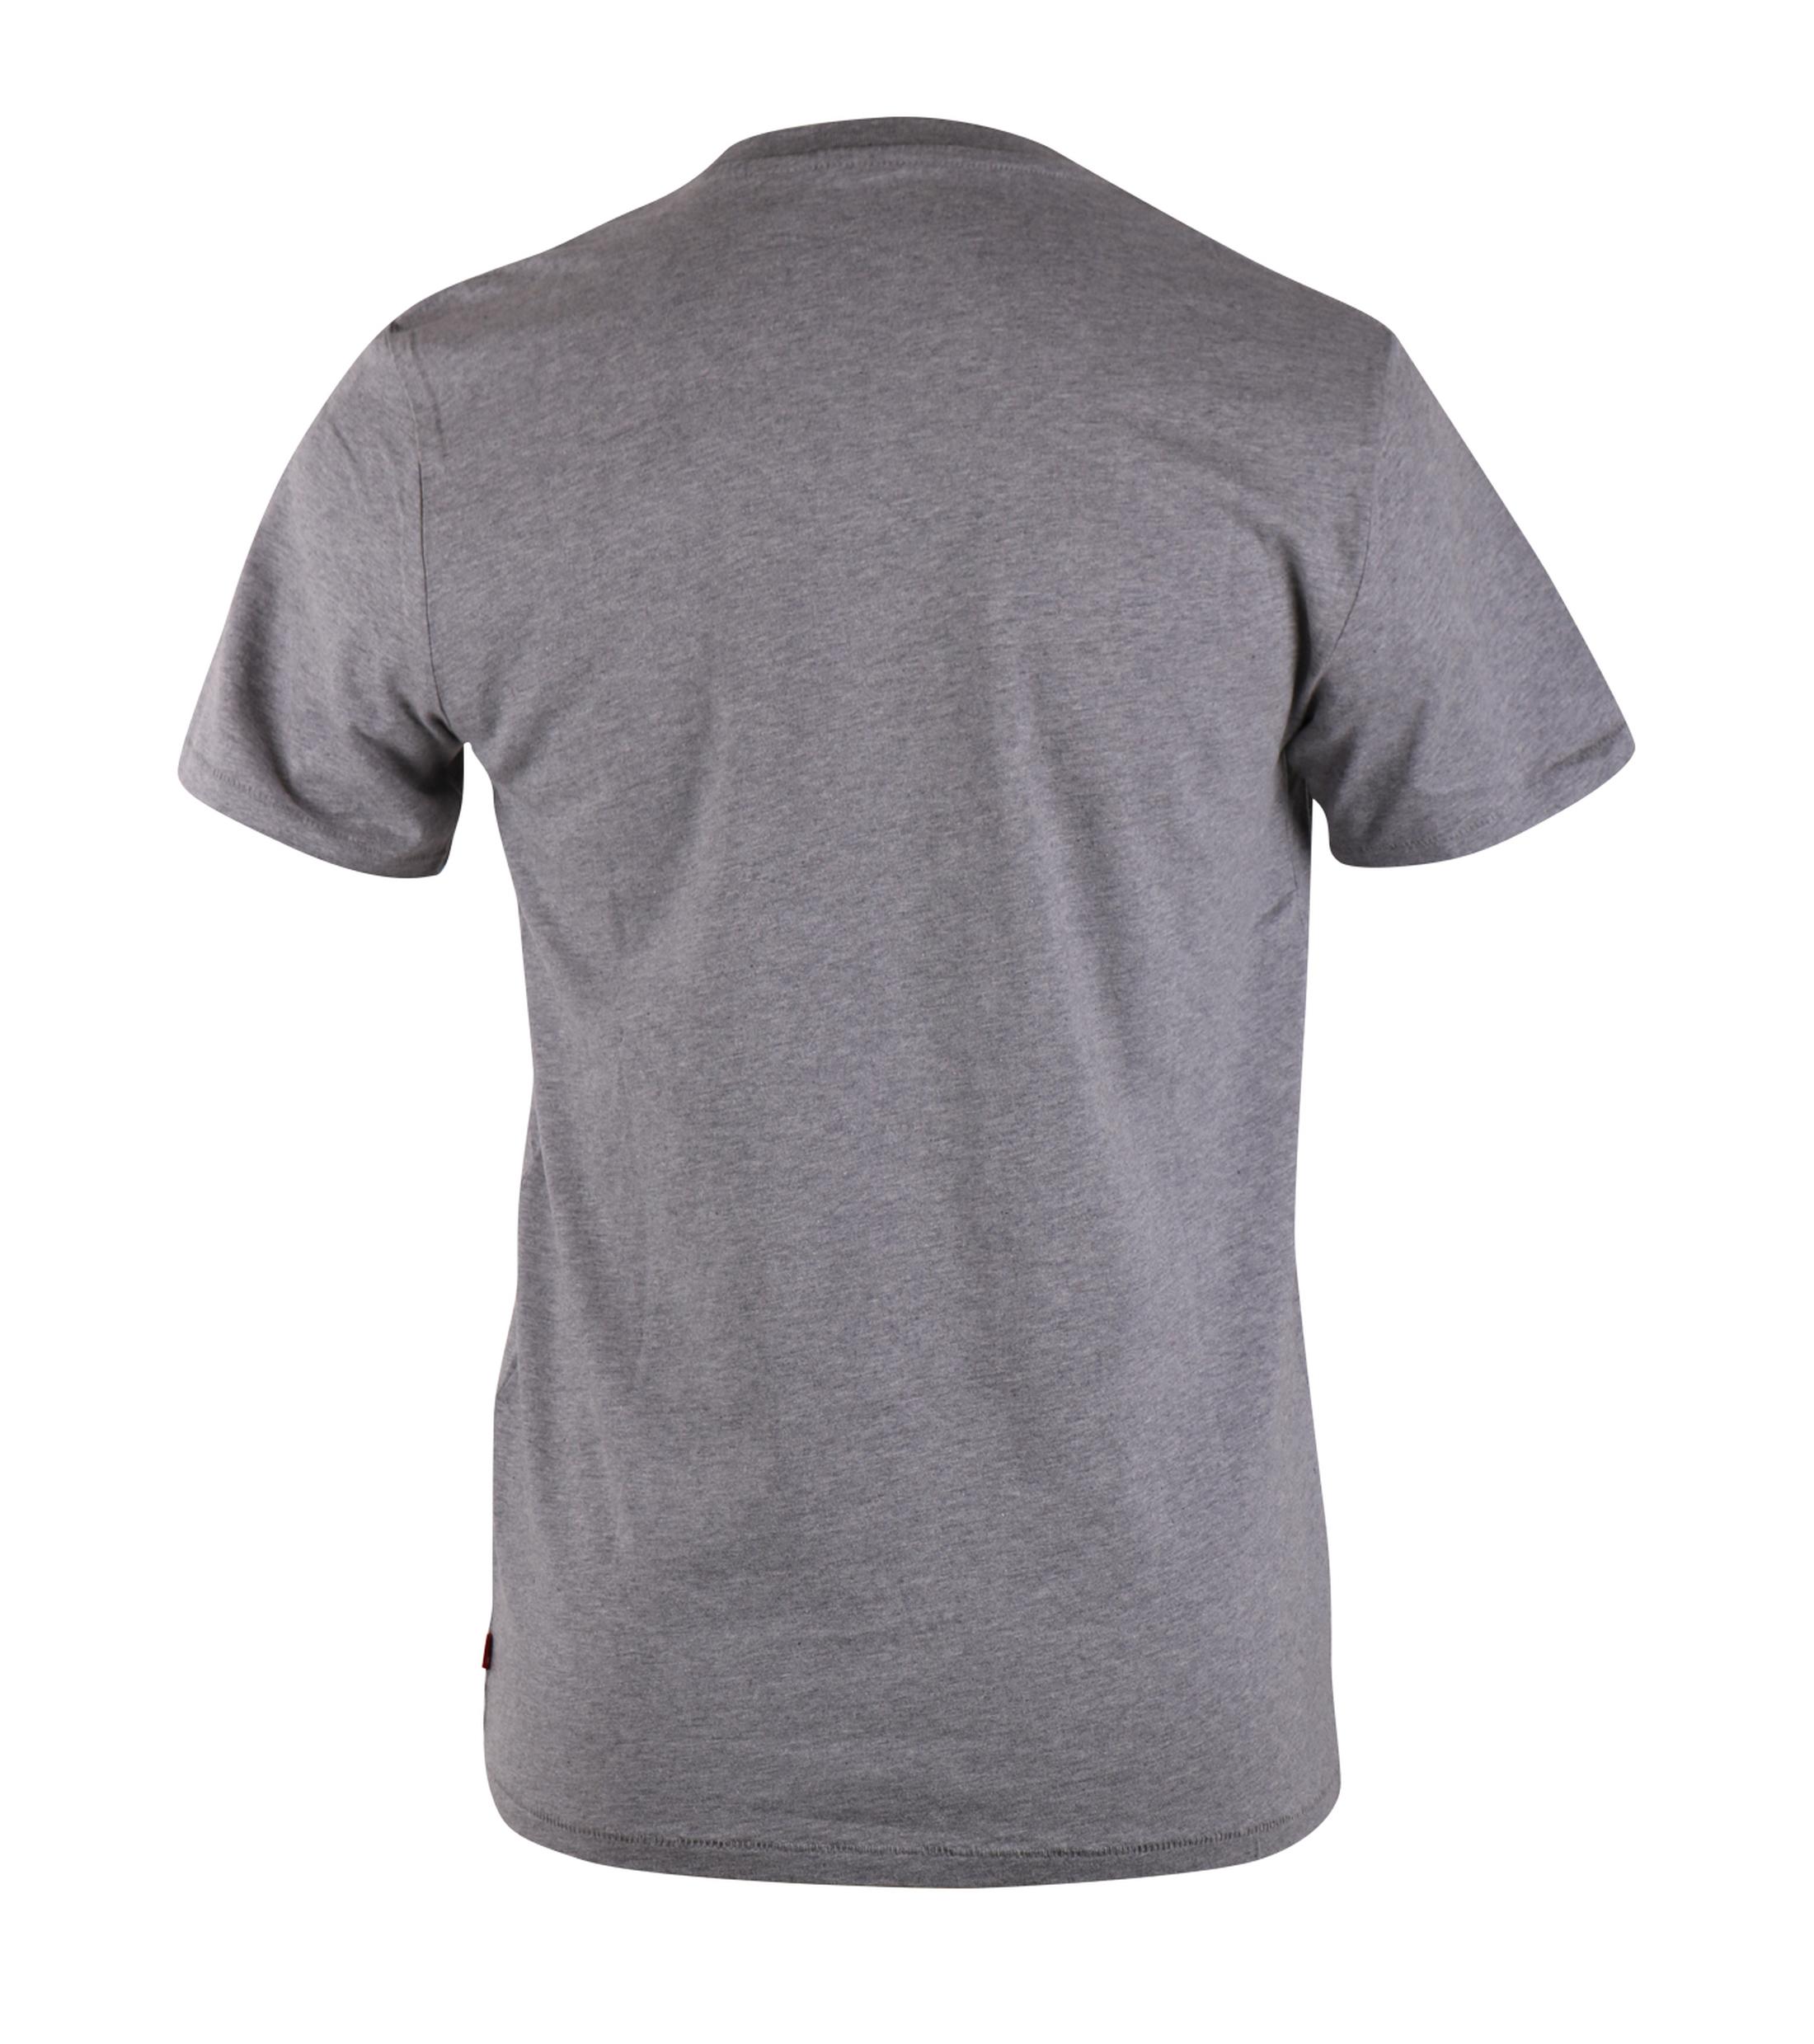 f146725f1c203c 0138 Print Grijs Grey Logo T 17783 Graphic Shirt Levi s wZ0xqTnUaU